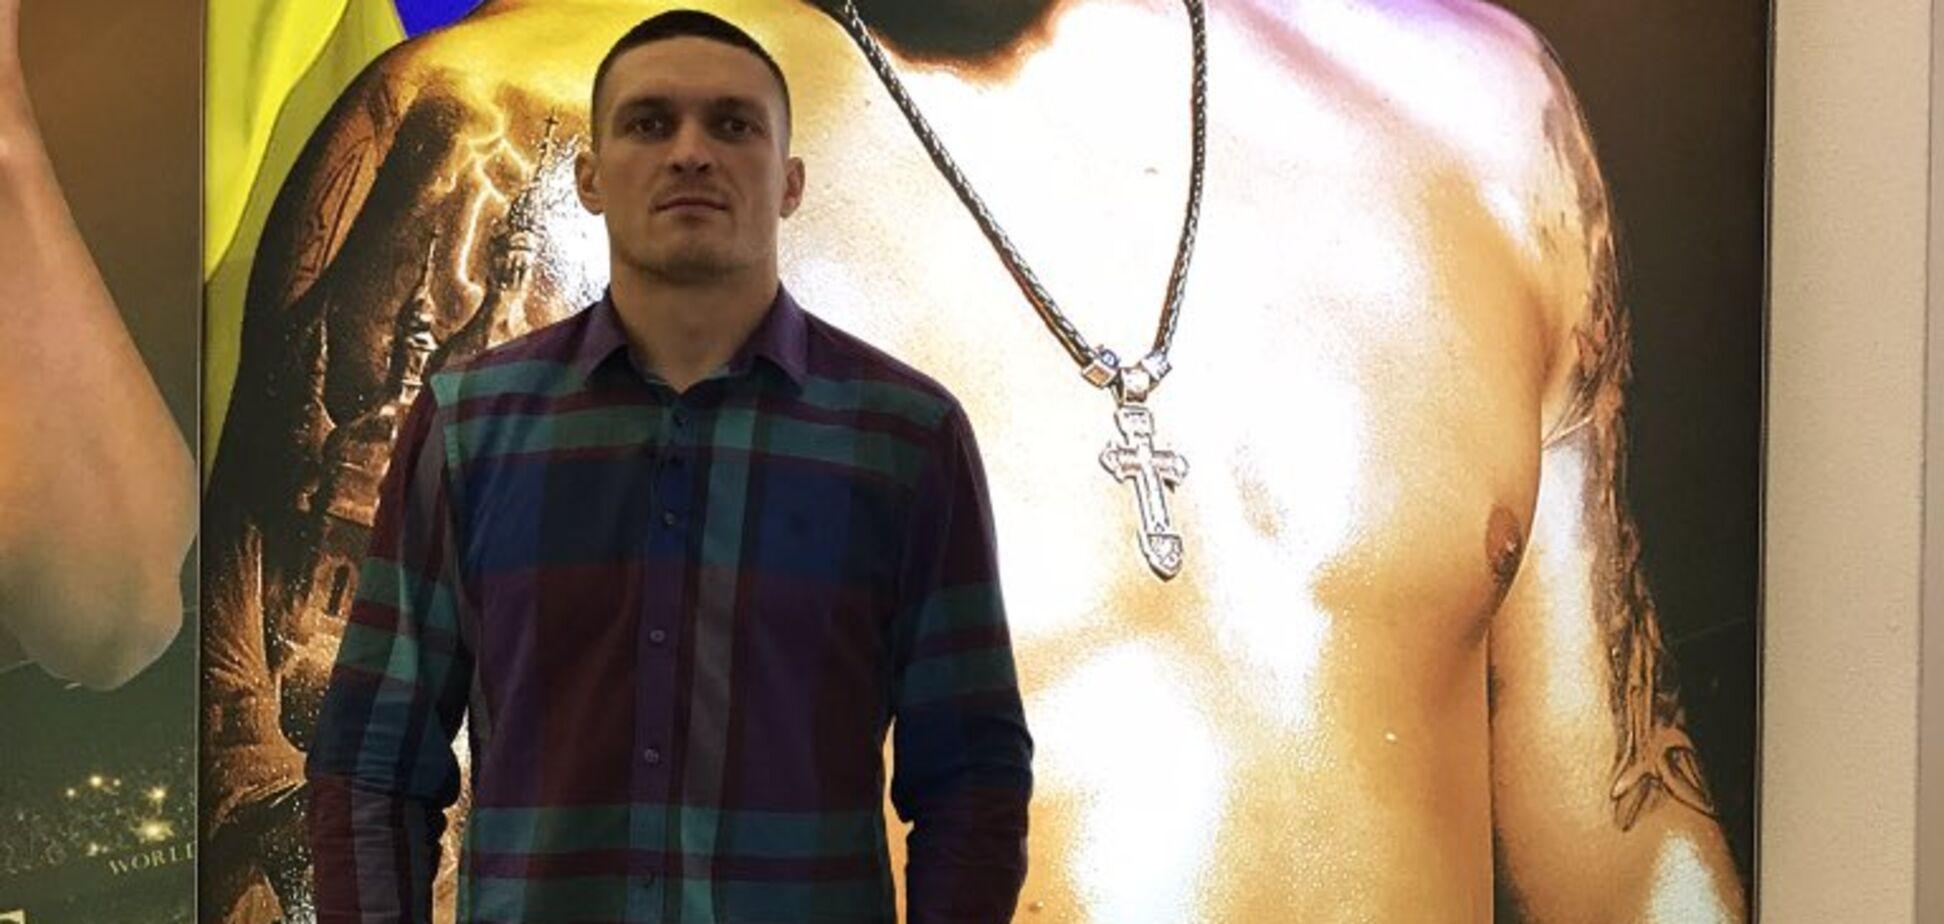 'Не дамо свій край нікому': Усик в Москве 'поиздевался' над россиянами